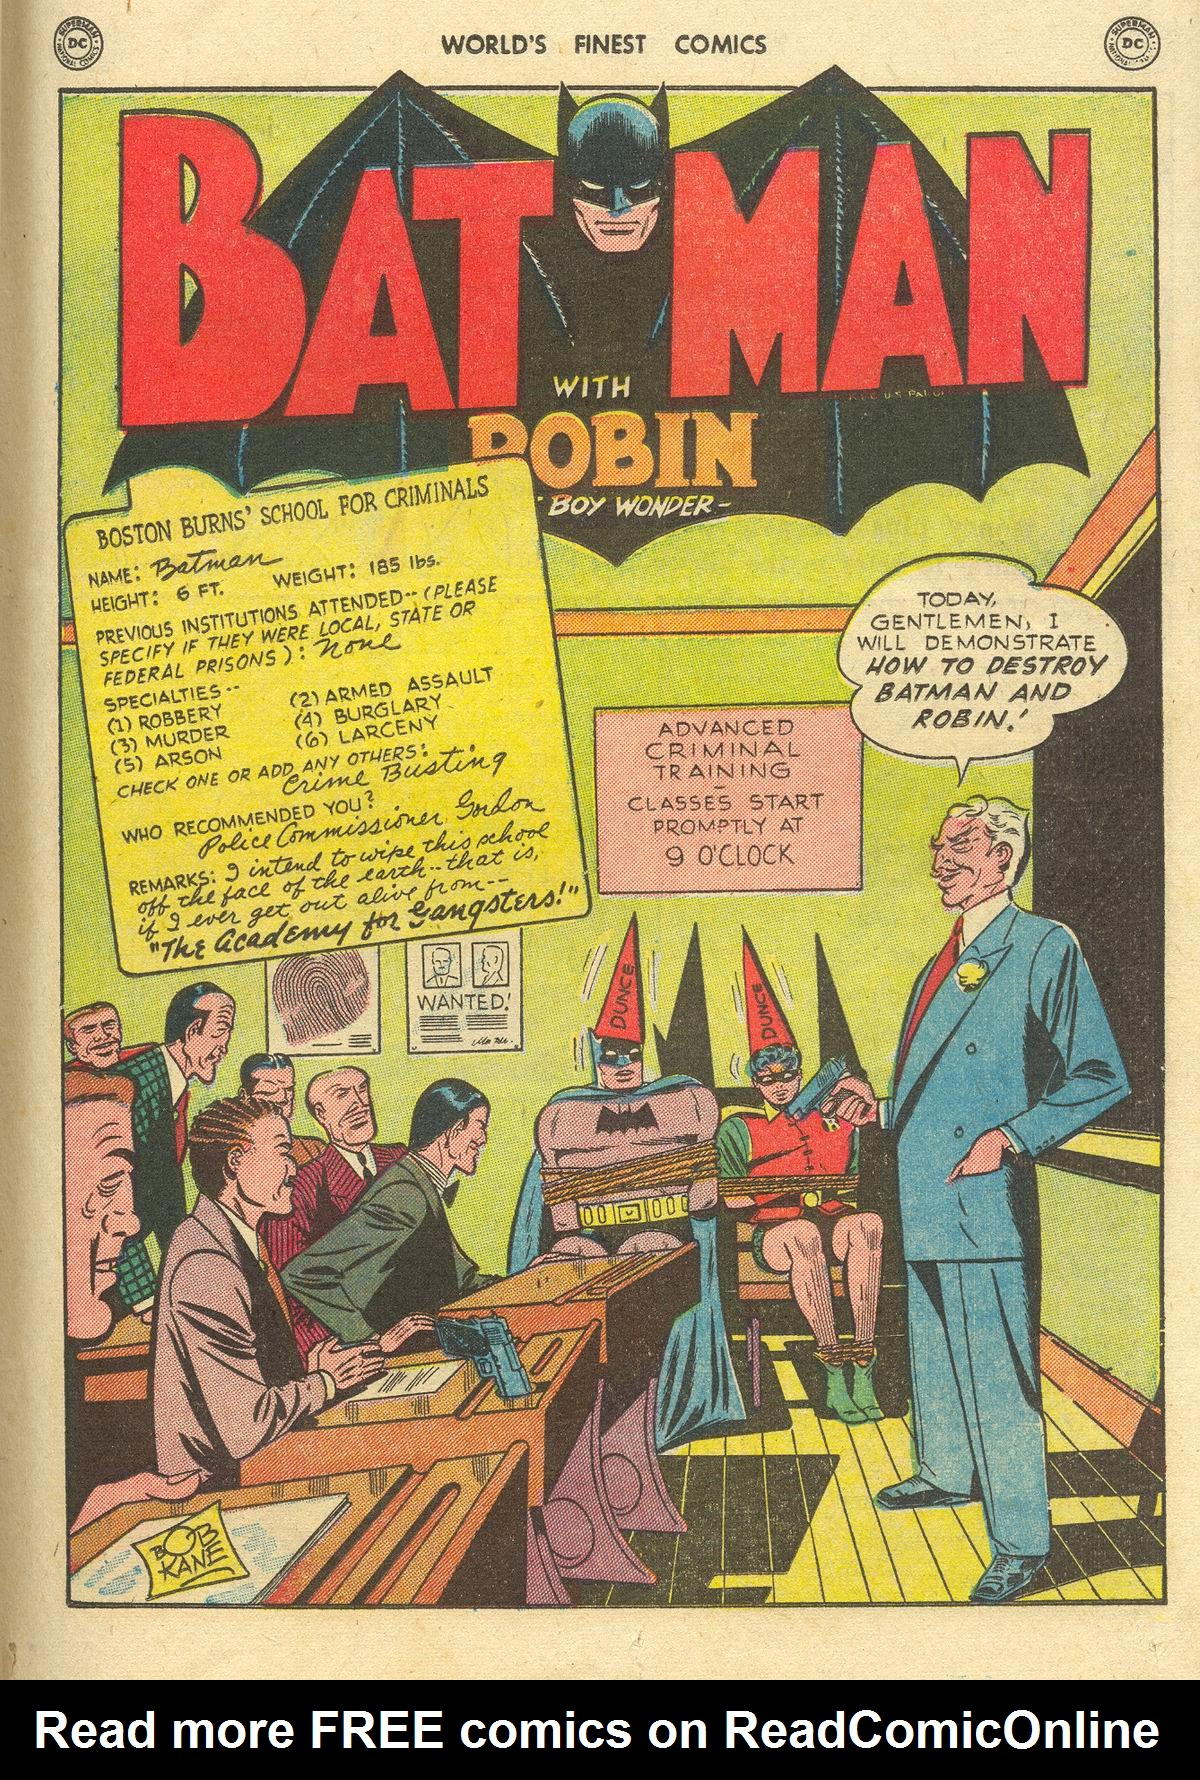 Read online World's Finest Comics comic -  Issue #51 - 63